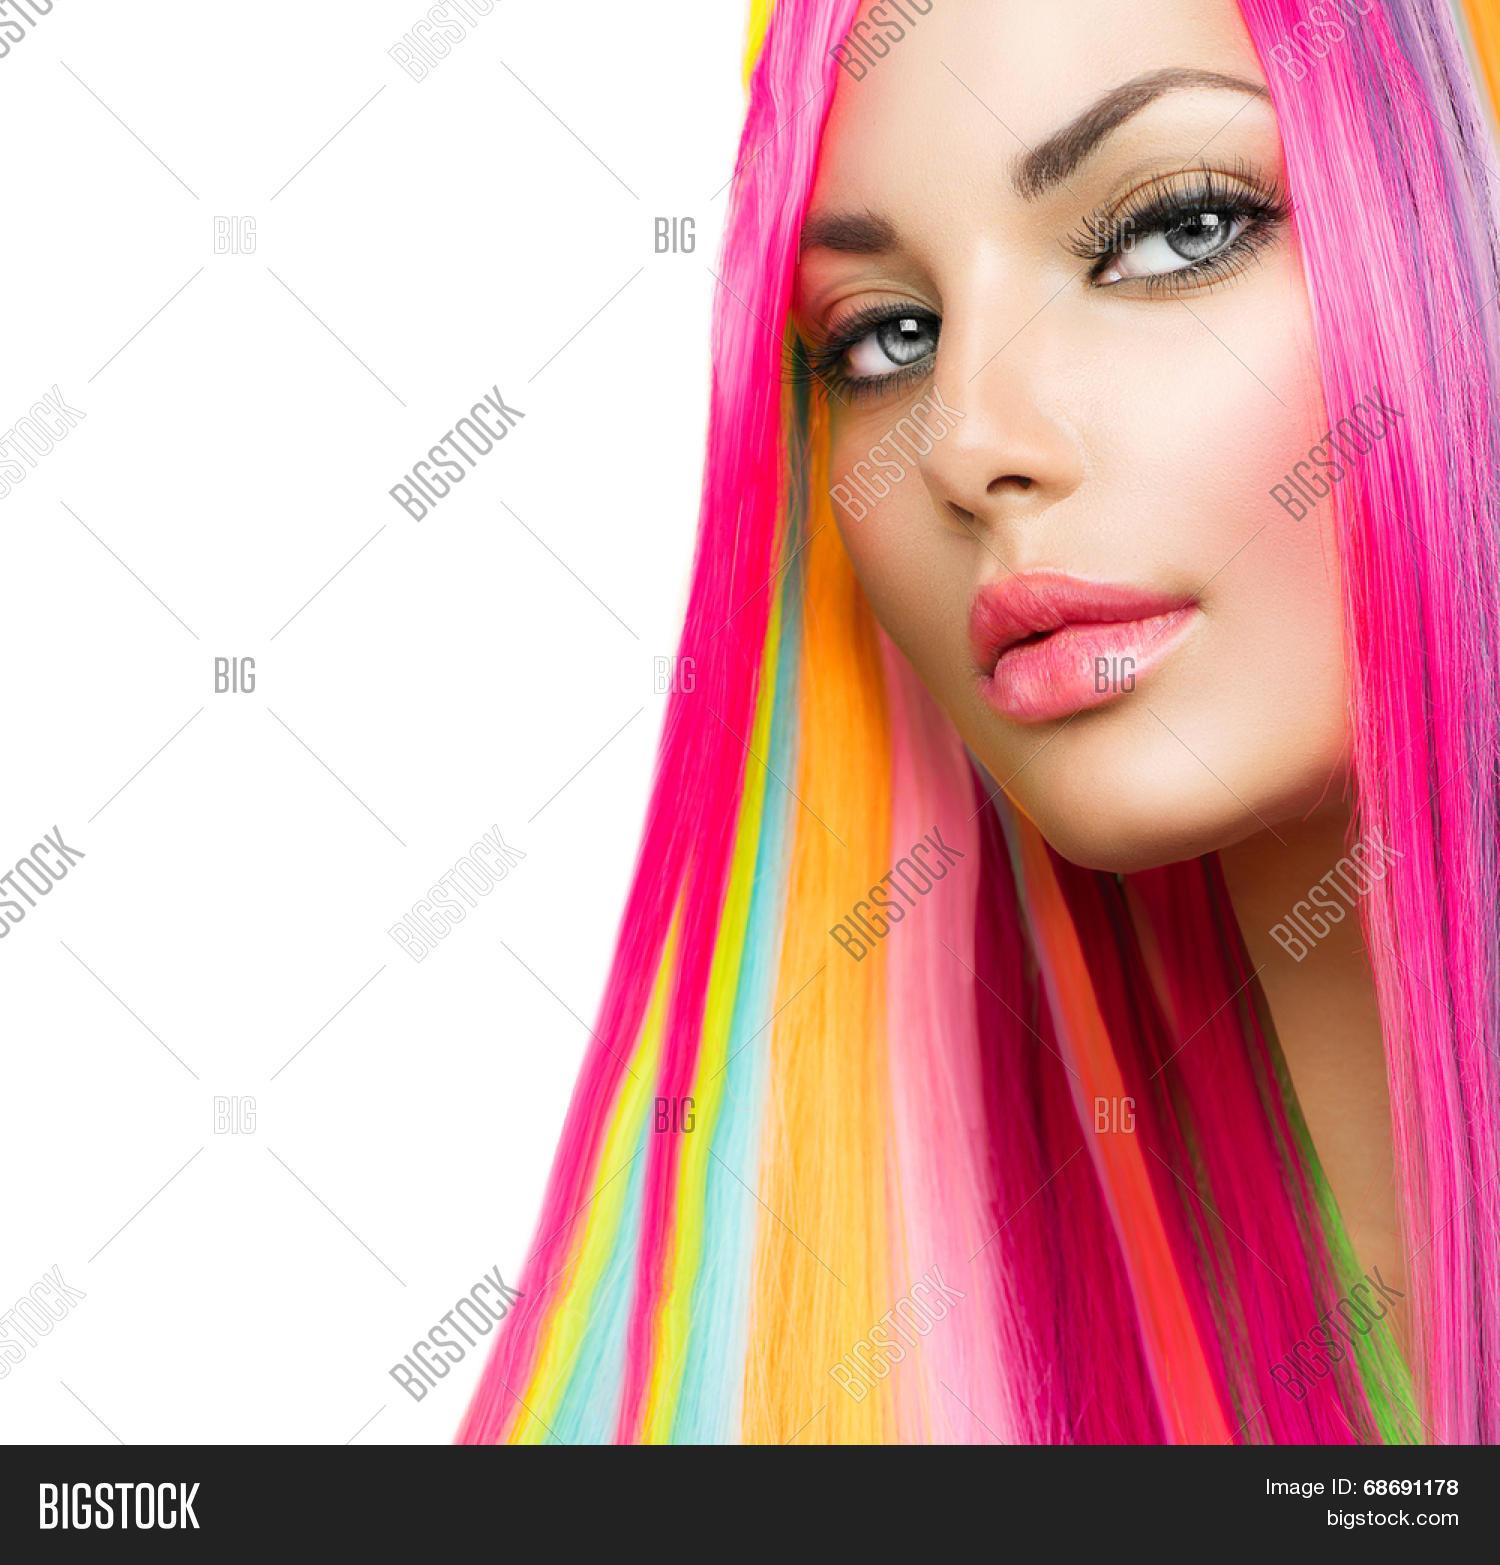 Colorful Hair Makeup Image Photo Free Trial Bigstock